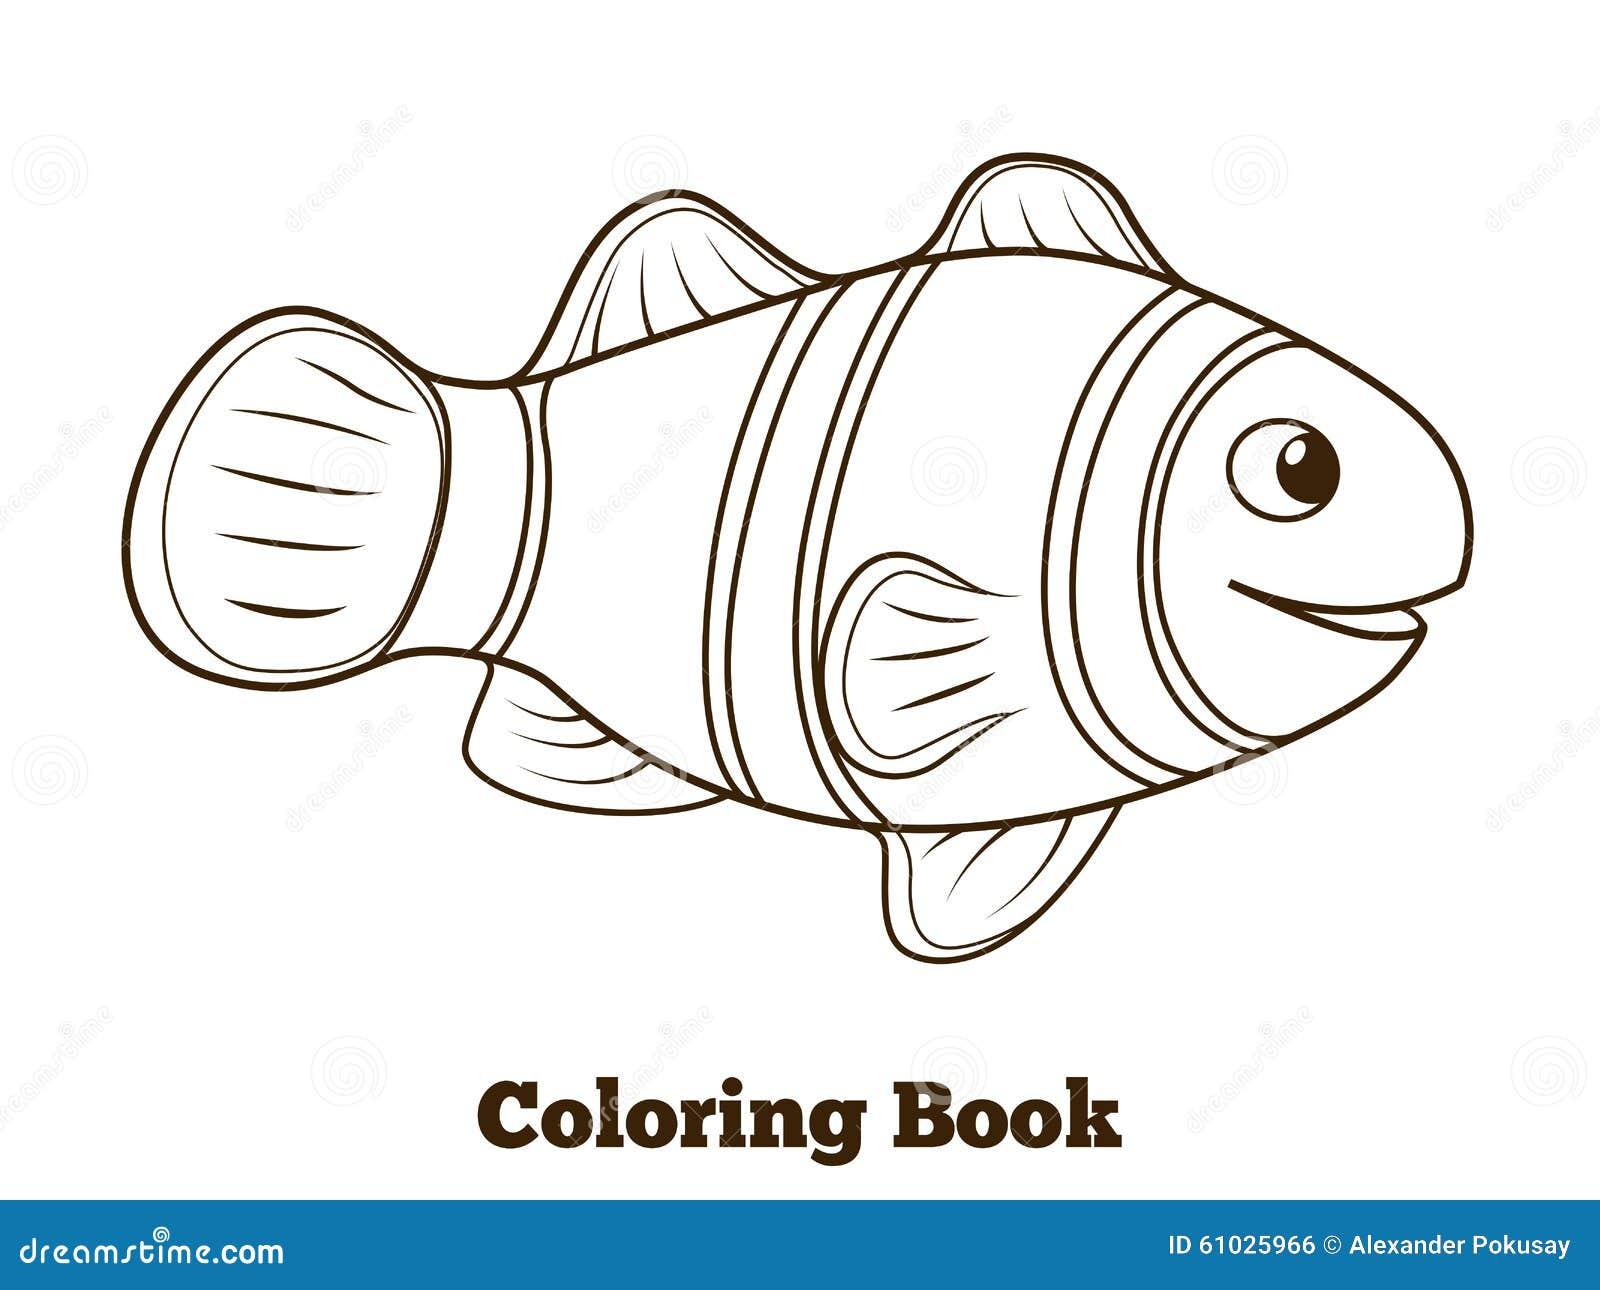 Coloring book clownfish fish cartoon vector stock vector for Colorful fish book